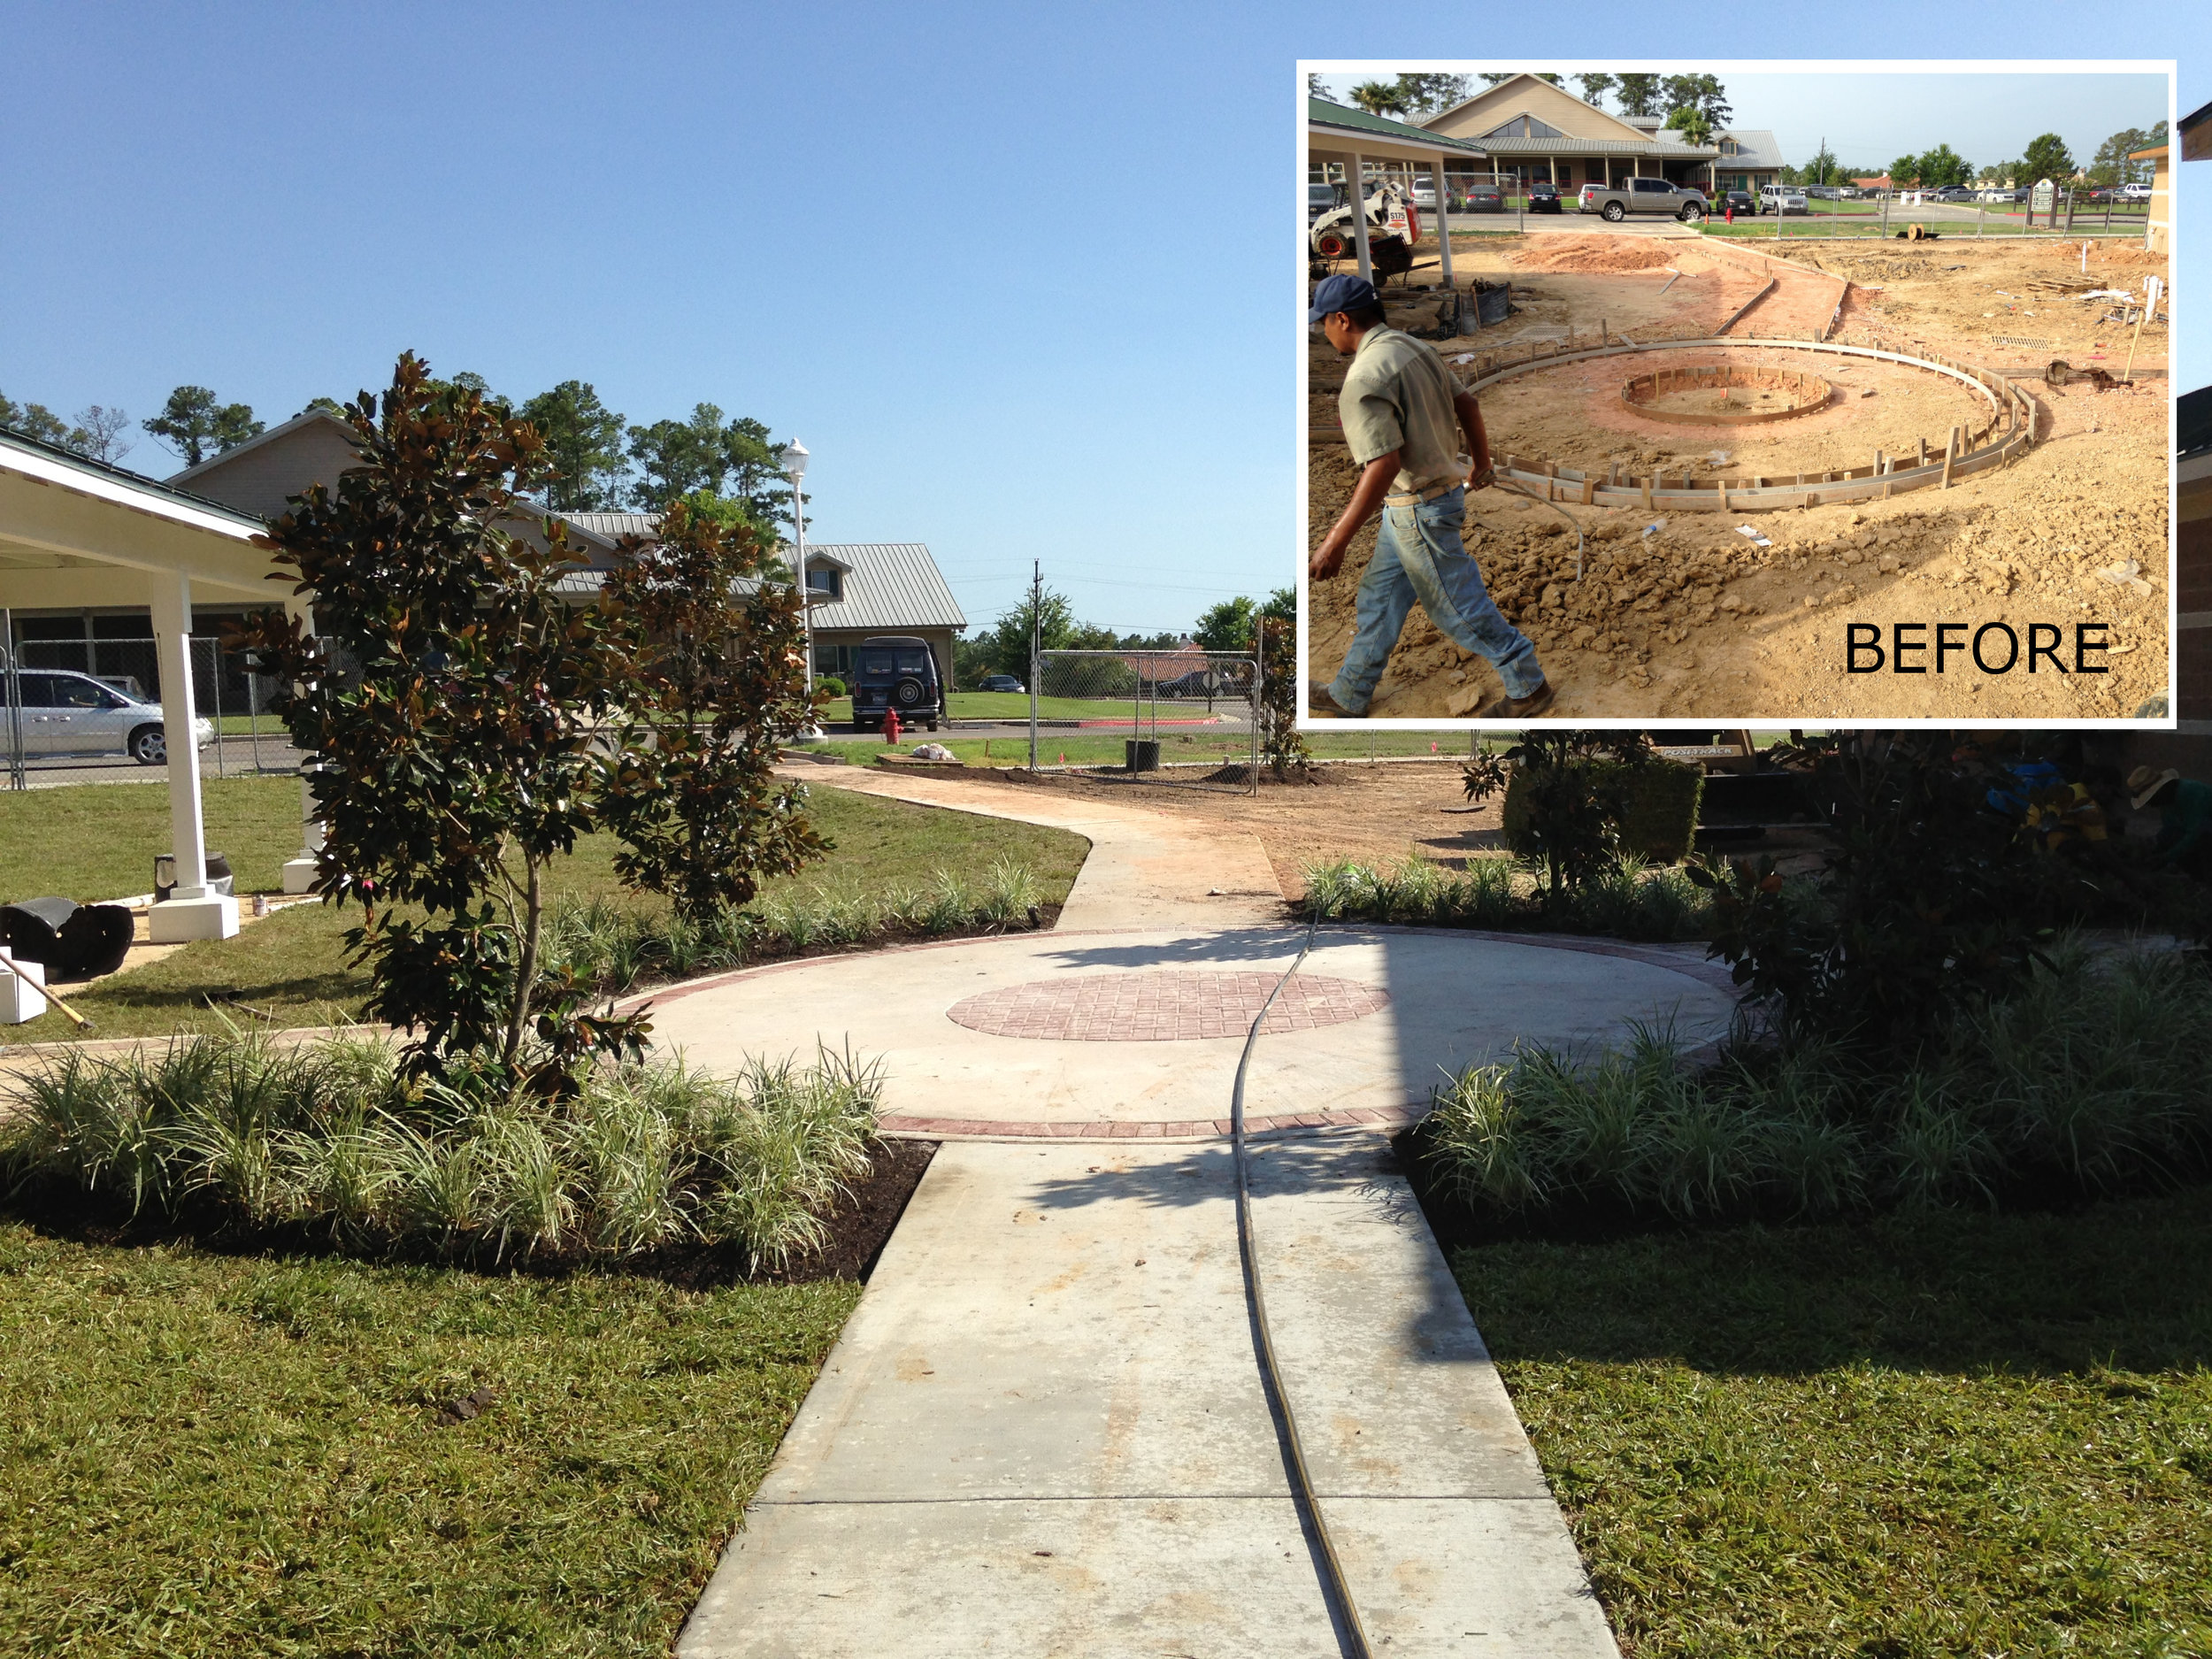 Decorative - (Image: Decorative sidewalk - before & after)